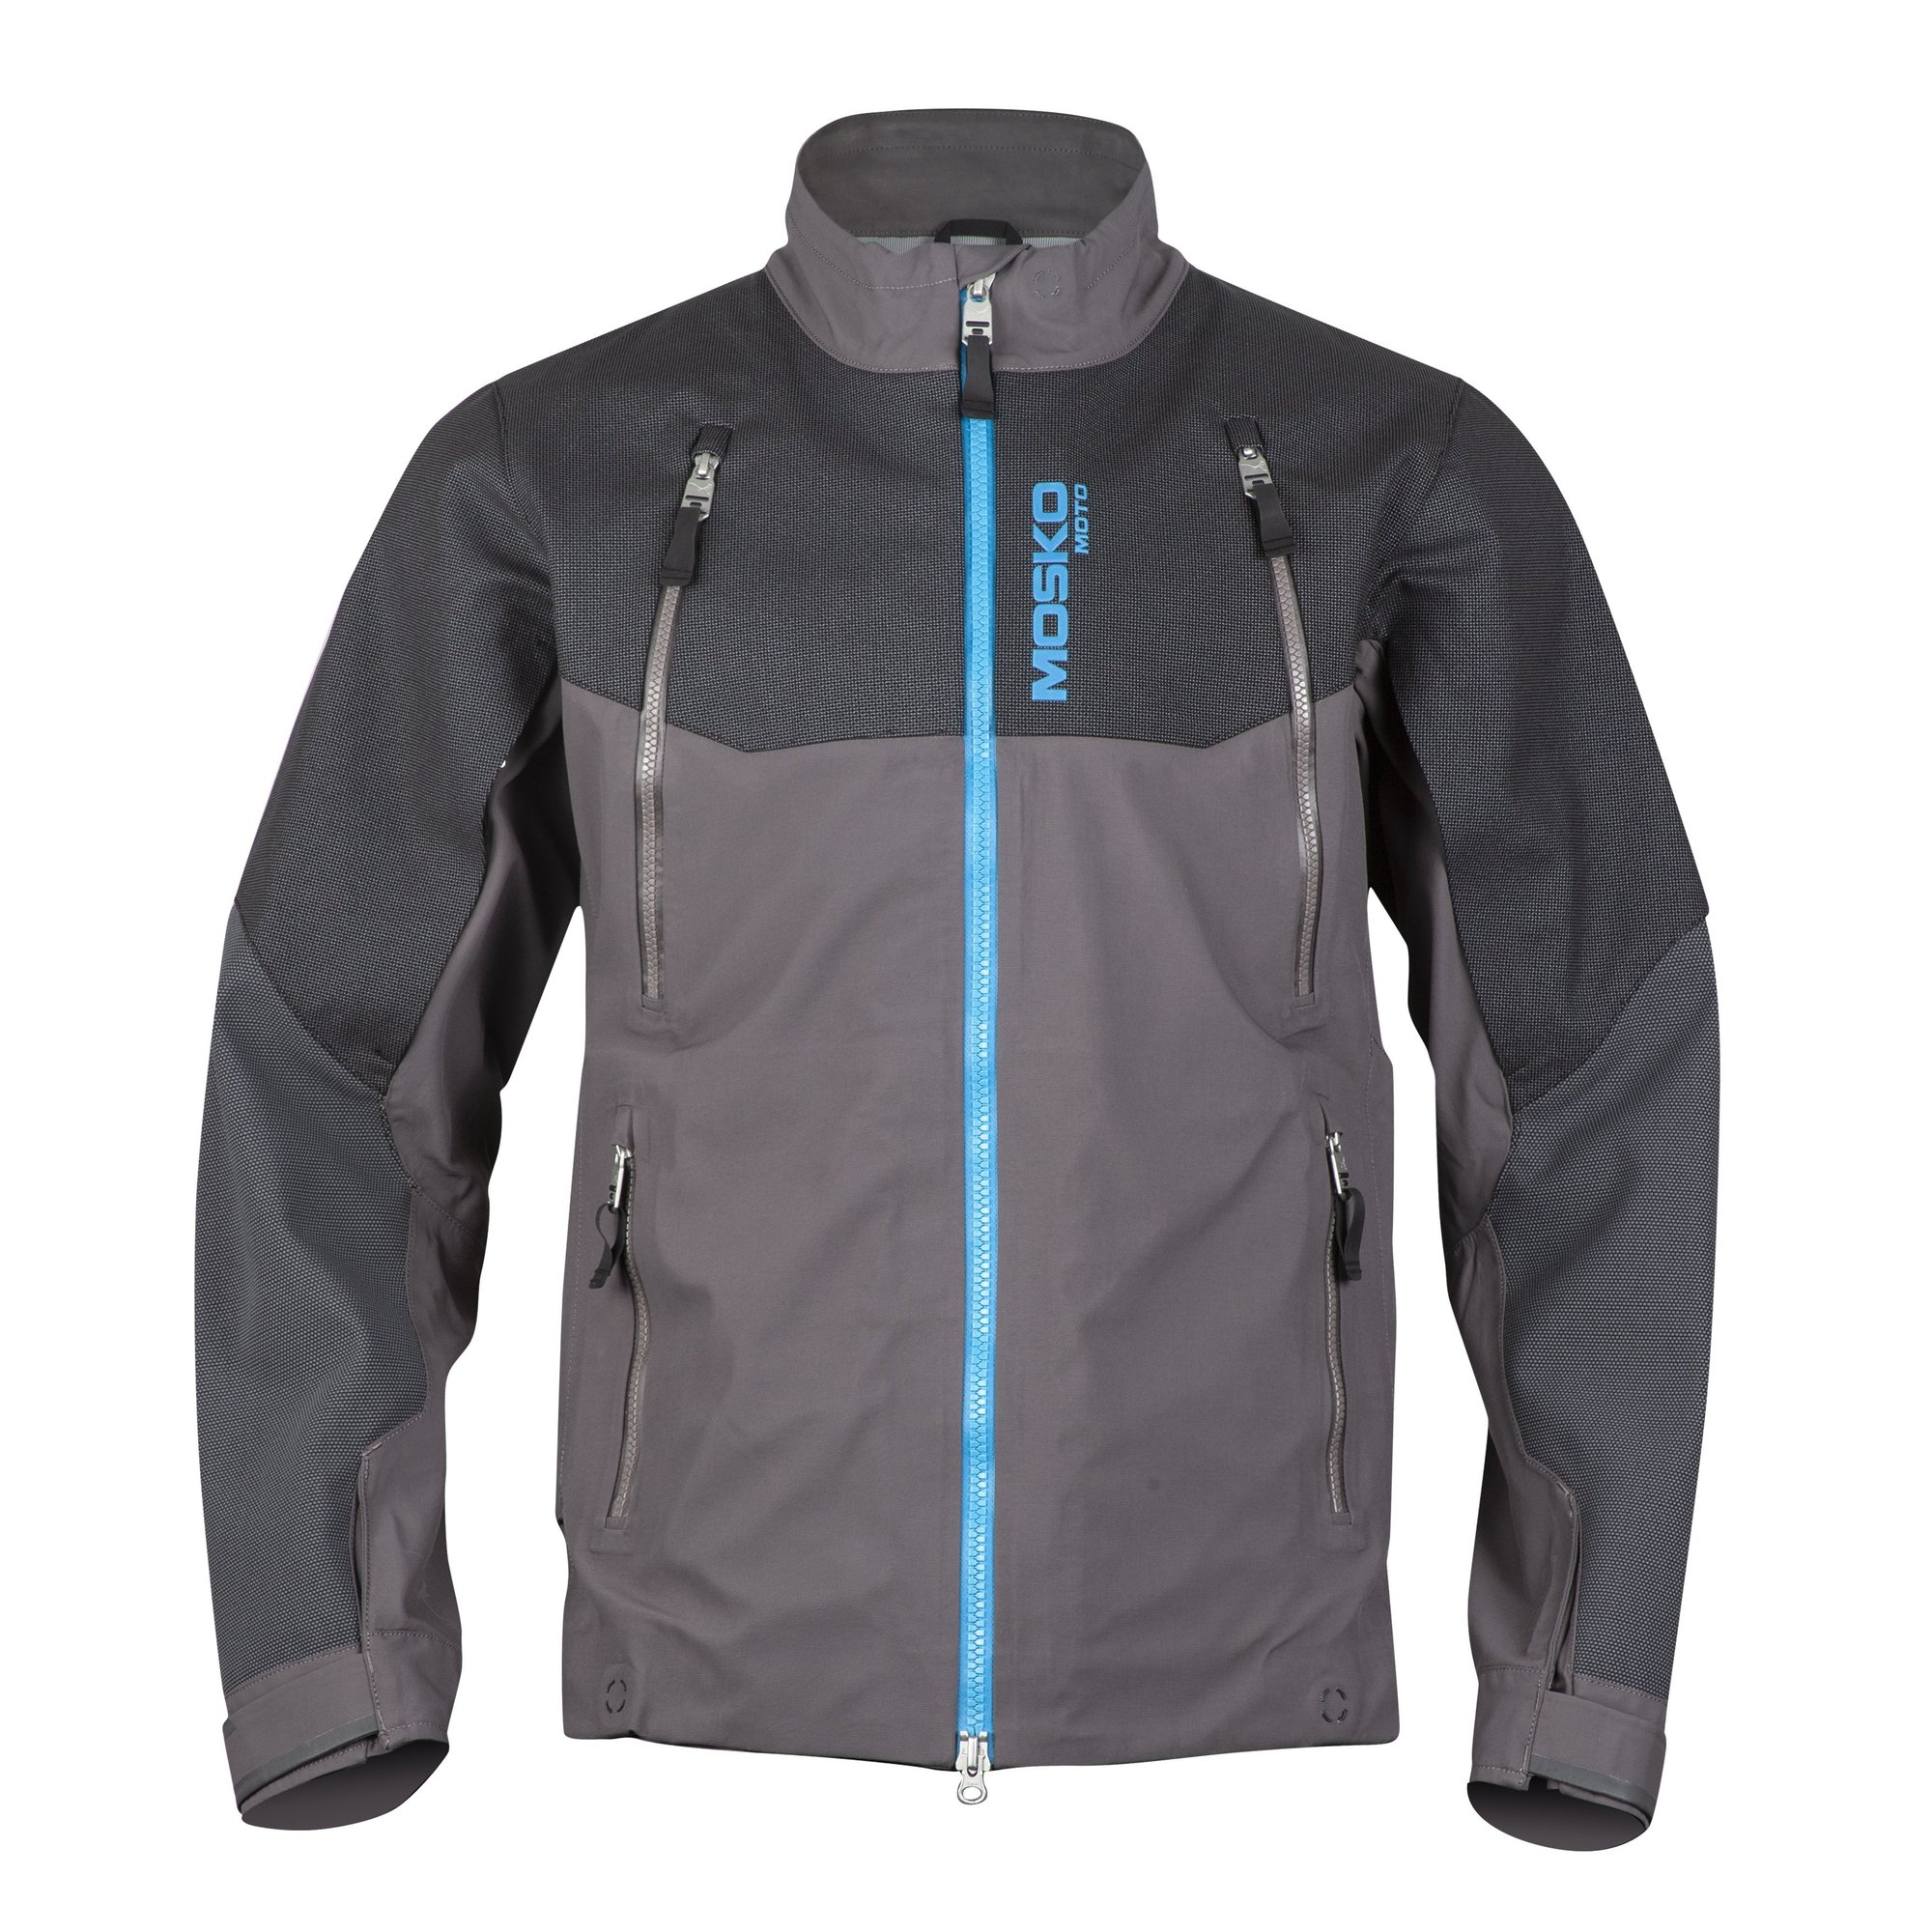 mosko-moto-apparel-s-charcoal-basilisk-jacket-11332269277245_2000x.jpg